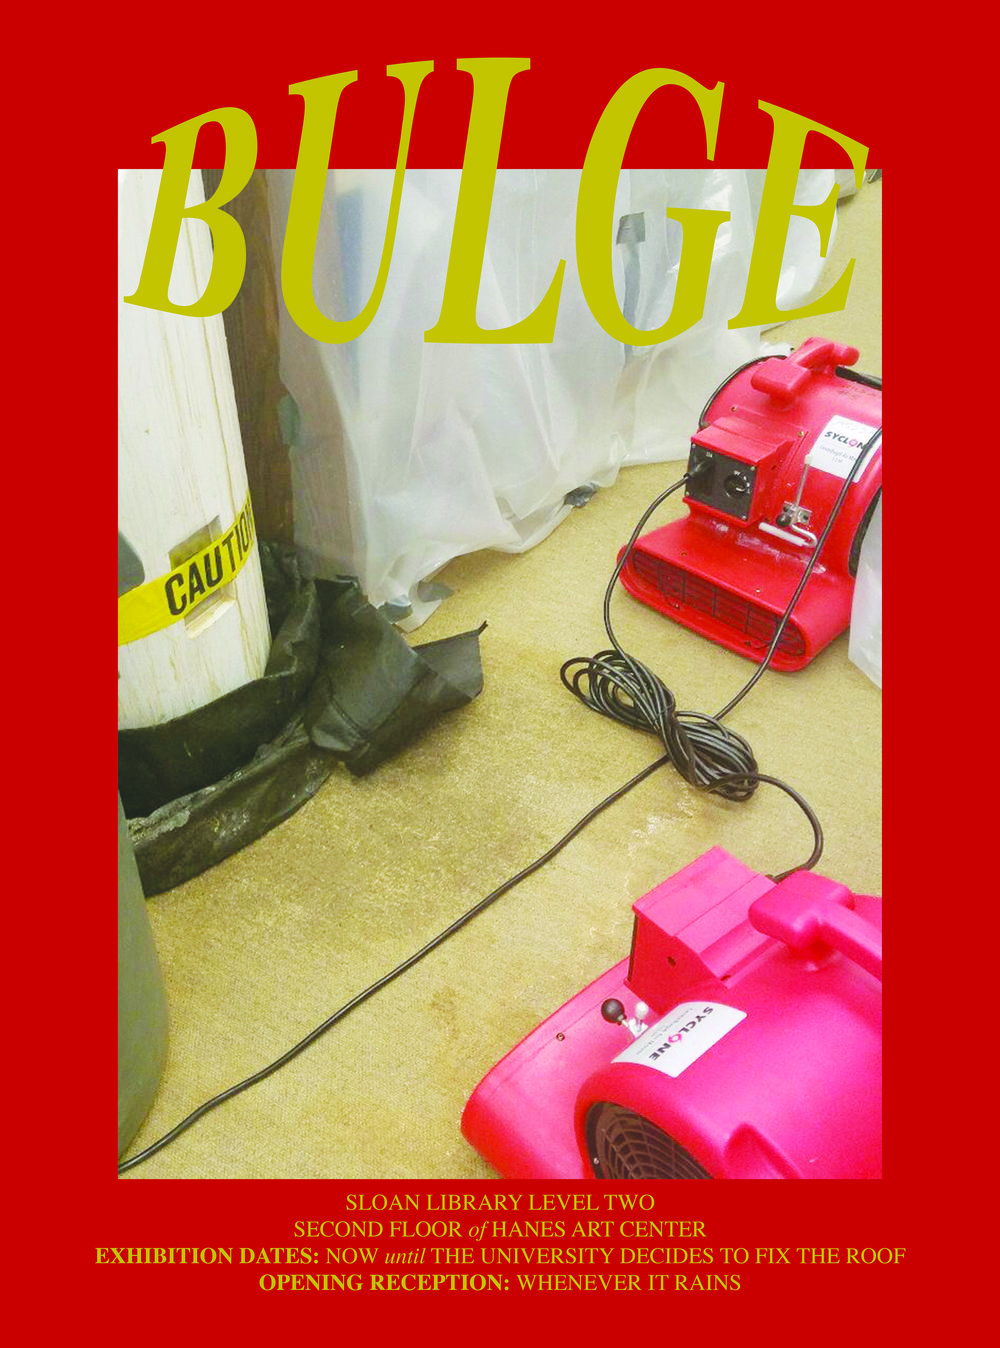 bulge poster 2.jpg